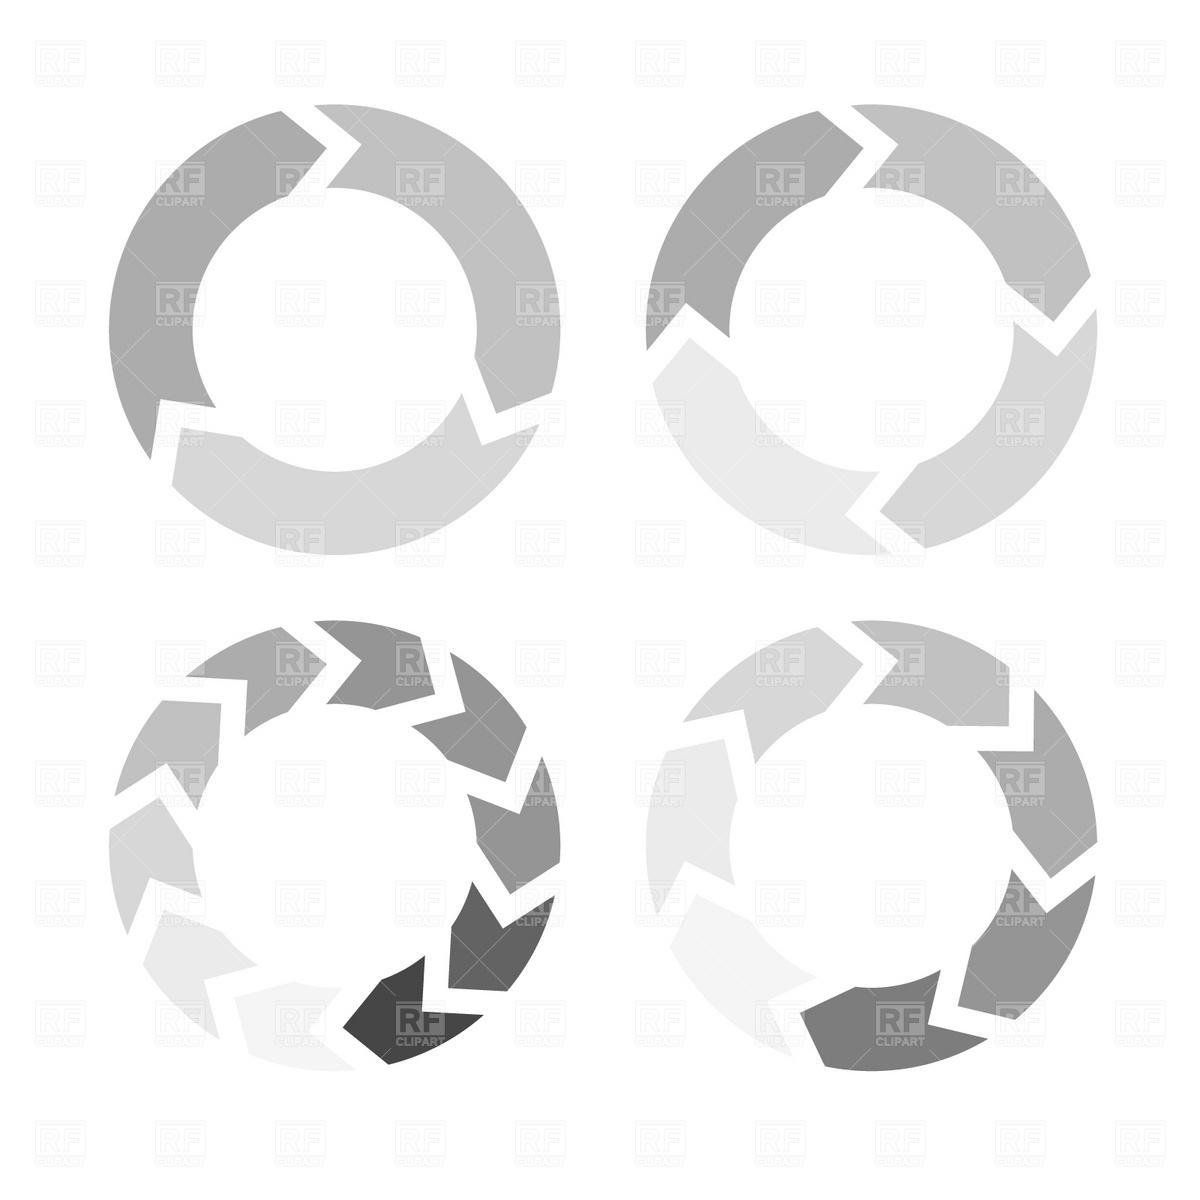 1200x1200 Arrows In A Circle Flow Vector Image Vector Artwork Of Signs